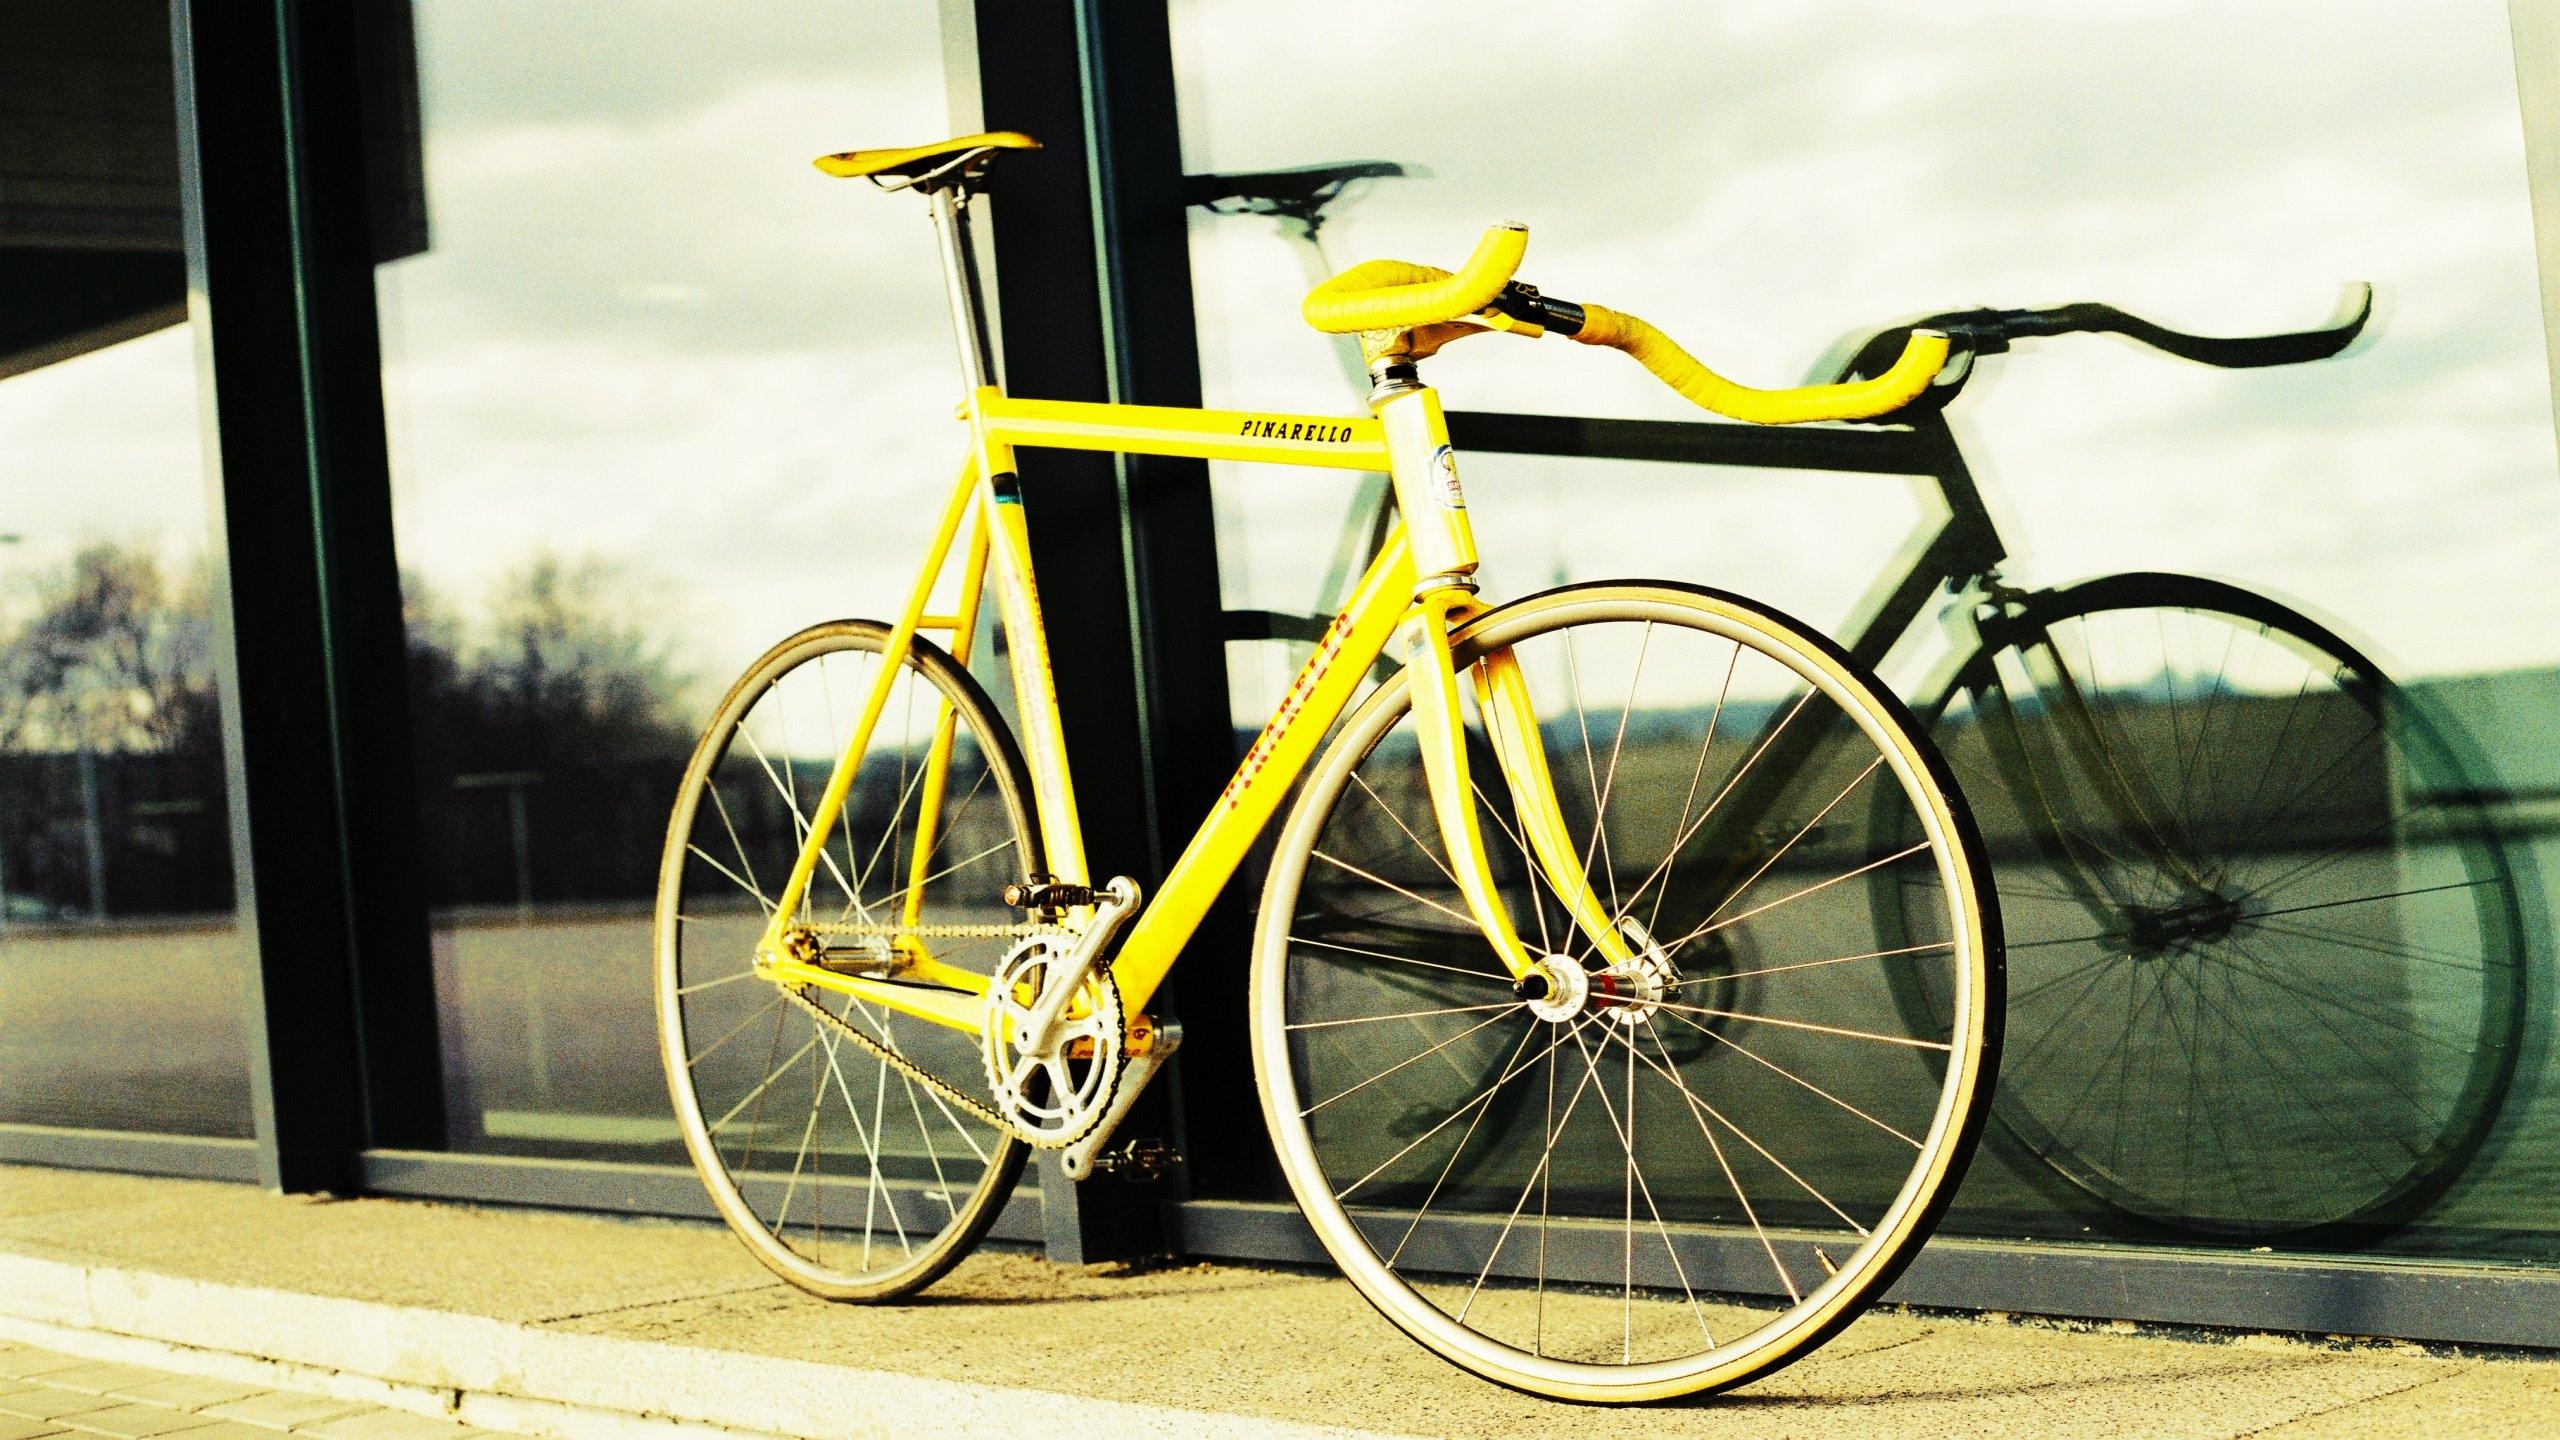 Wallpaper Fixie Bike Modificationmodifikasi Sepeda Fixie 2560x1440